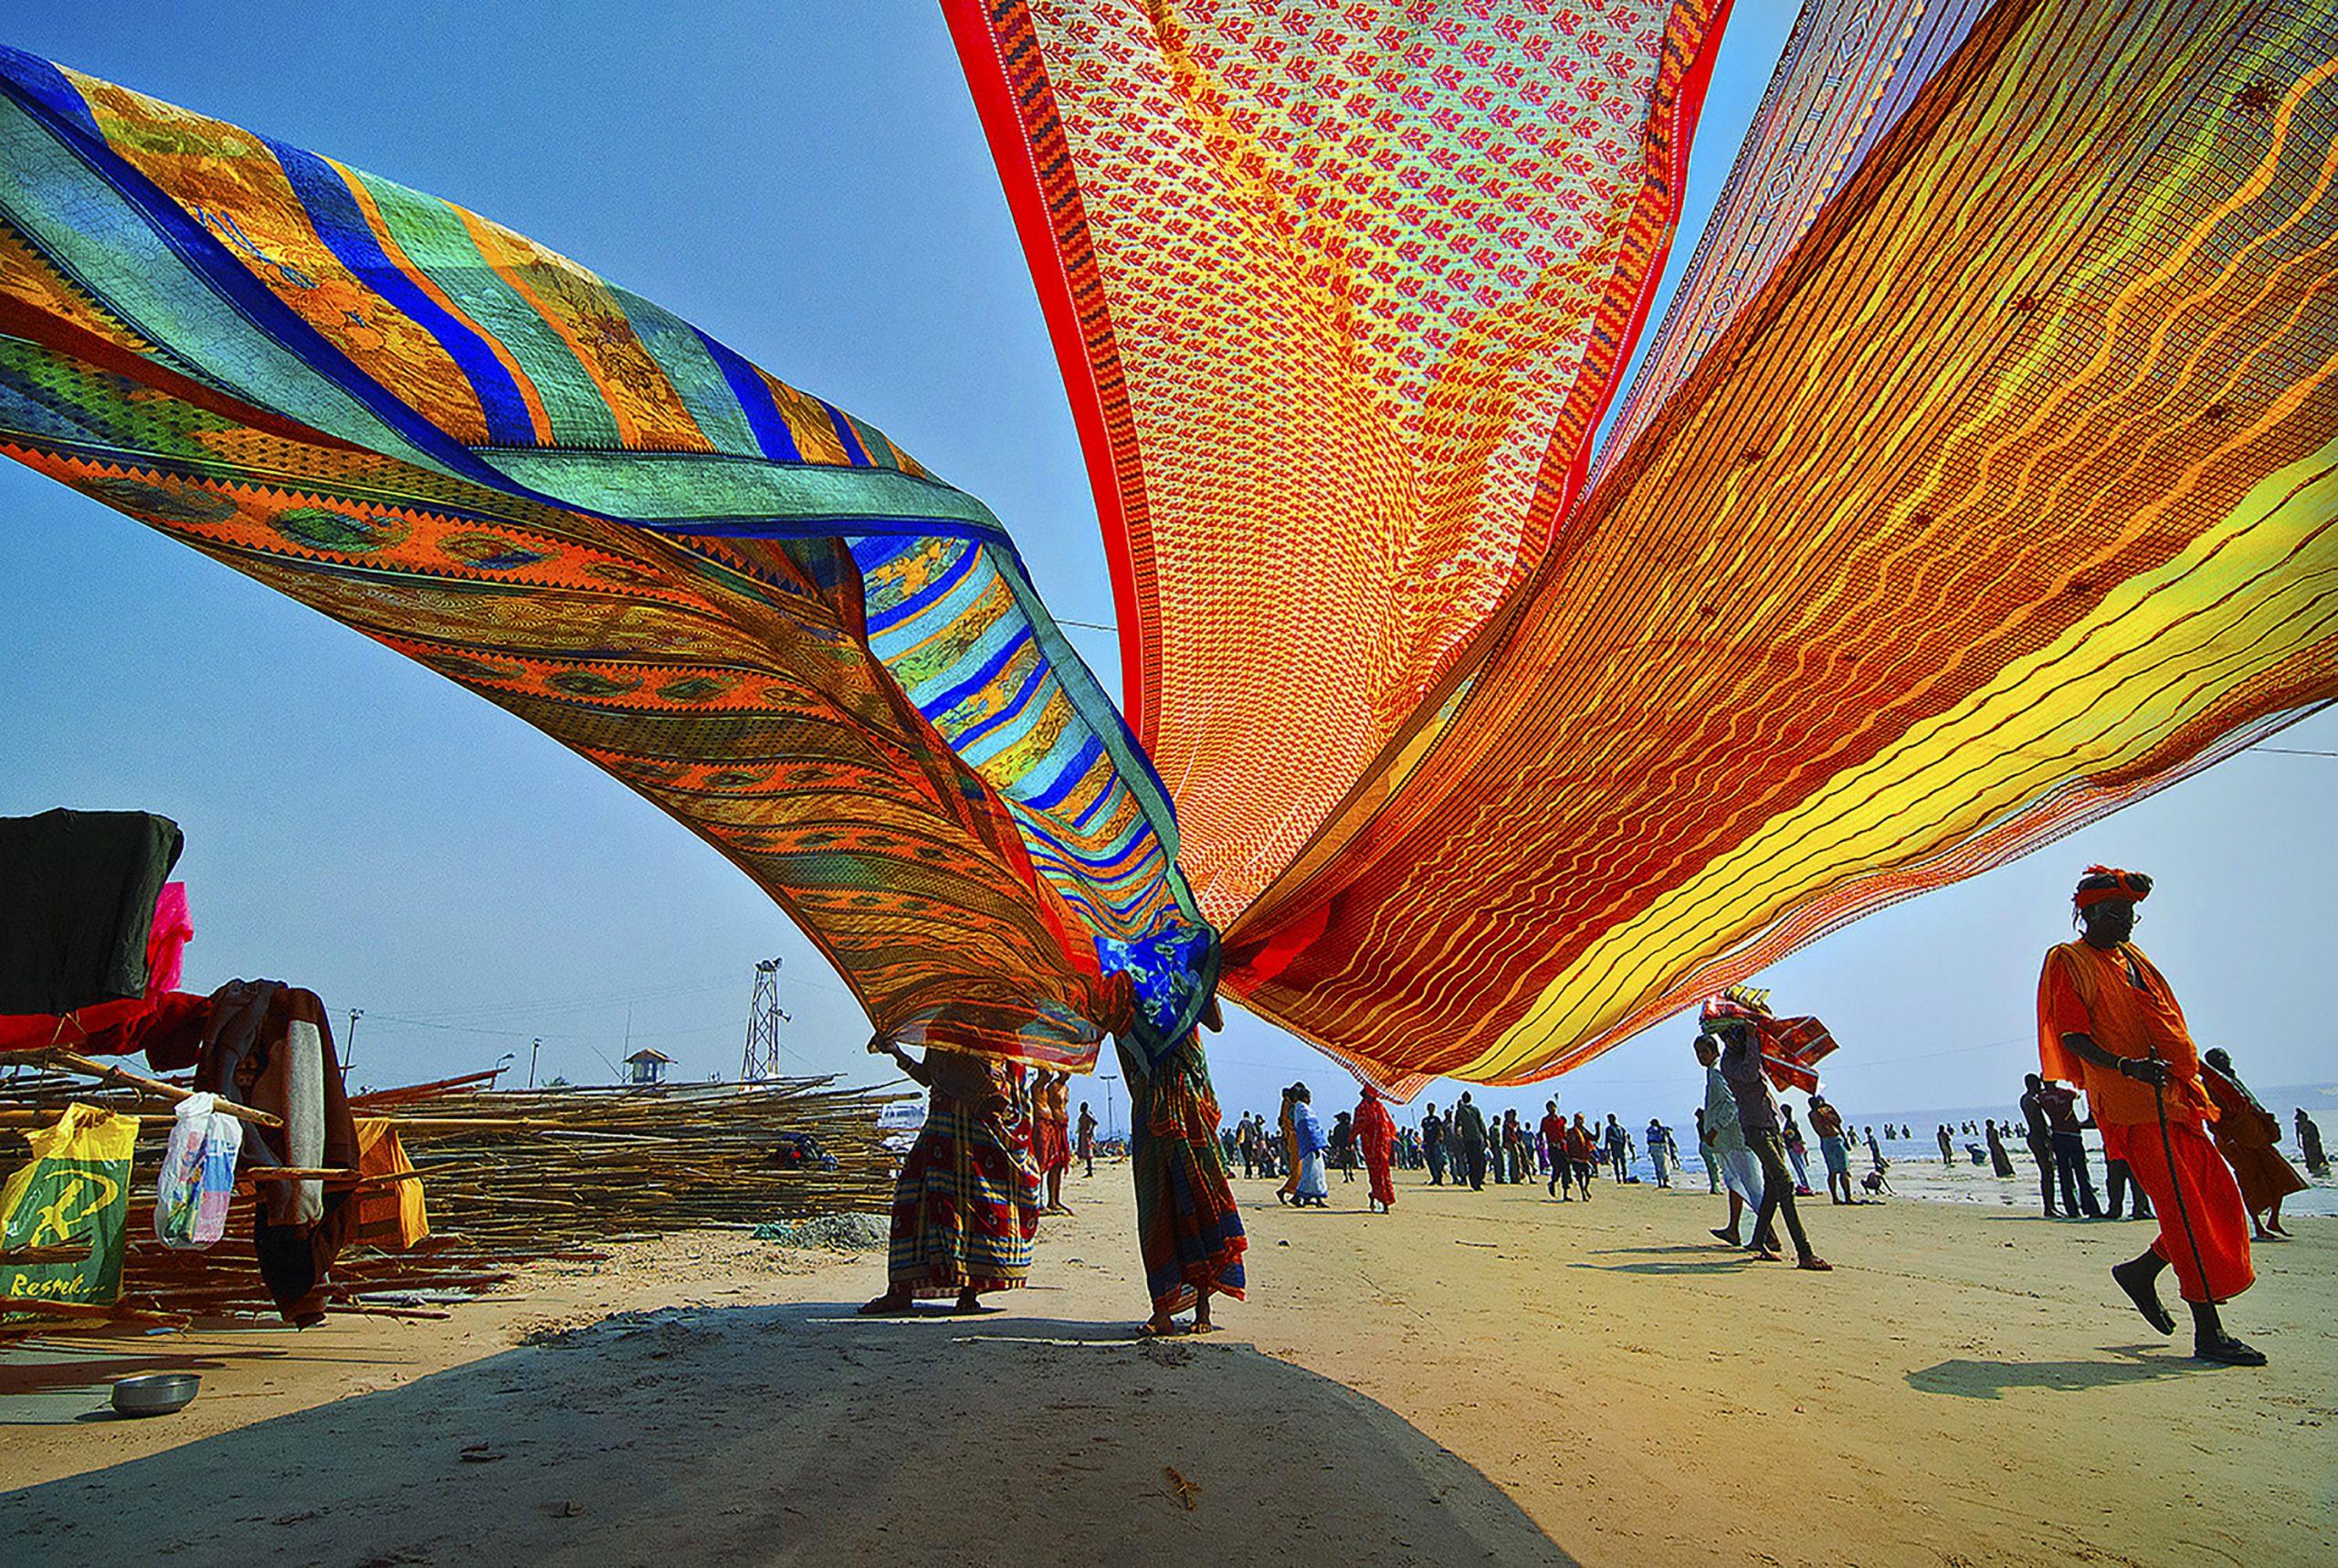 Waving Saree Cloth by the Beach